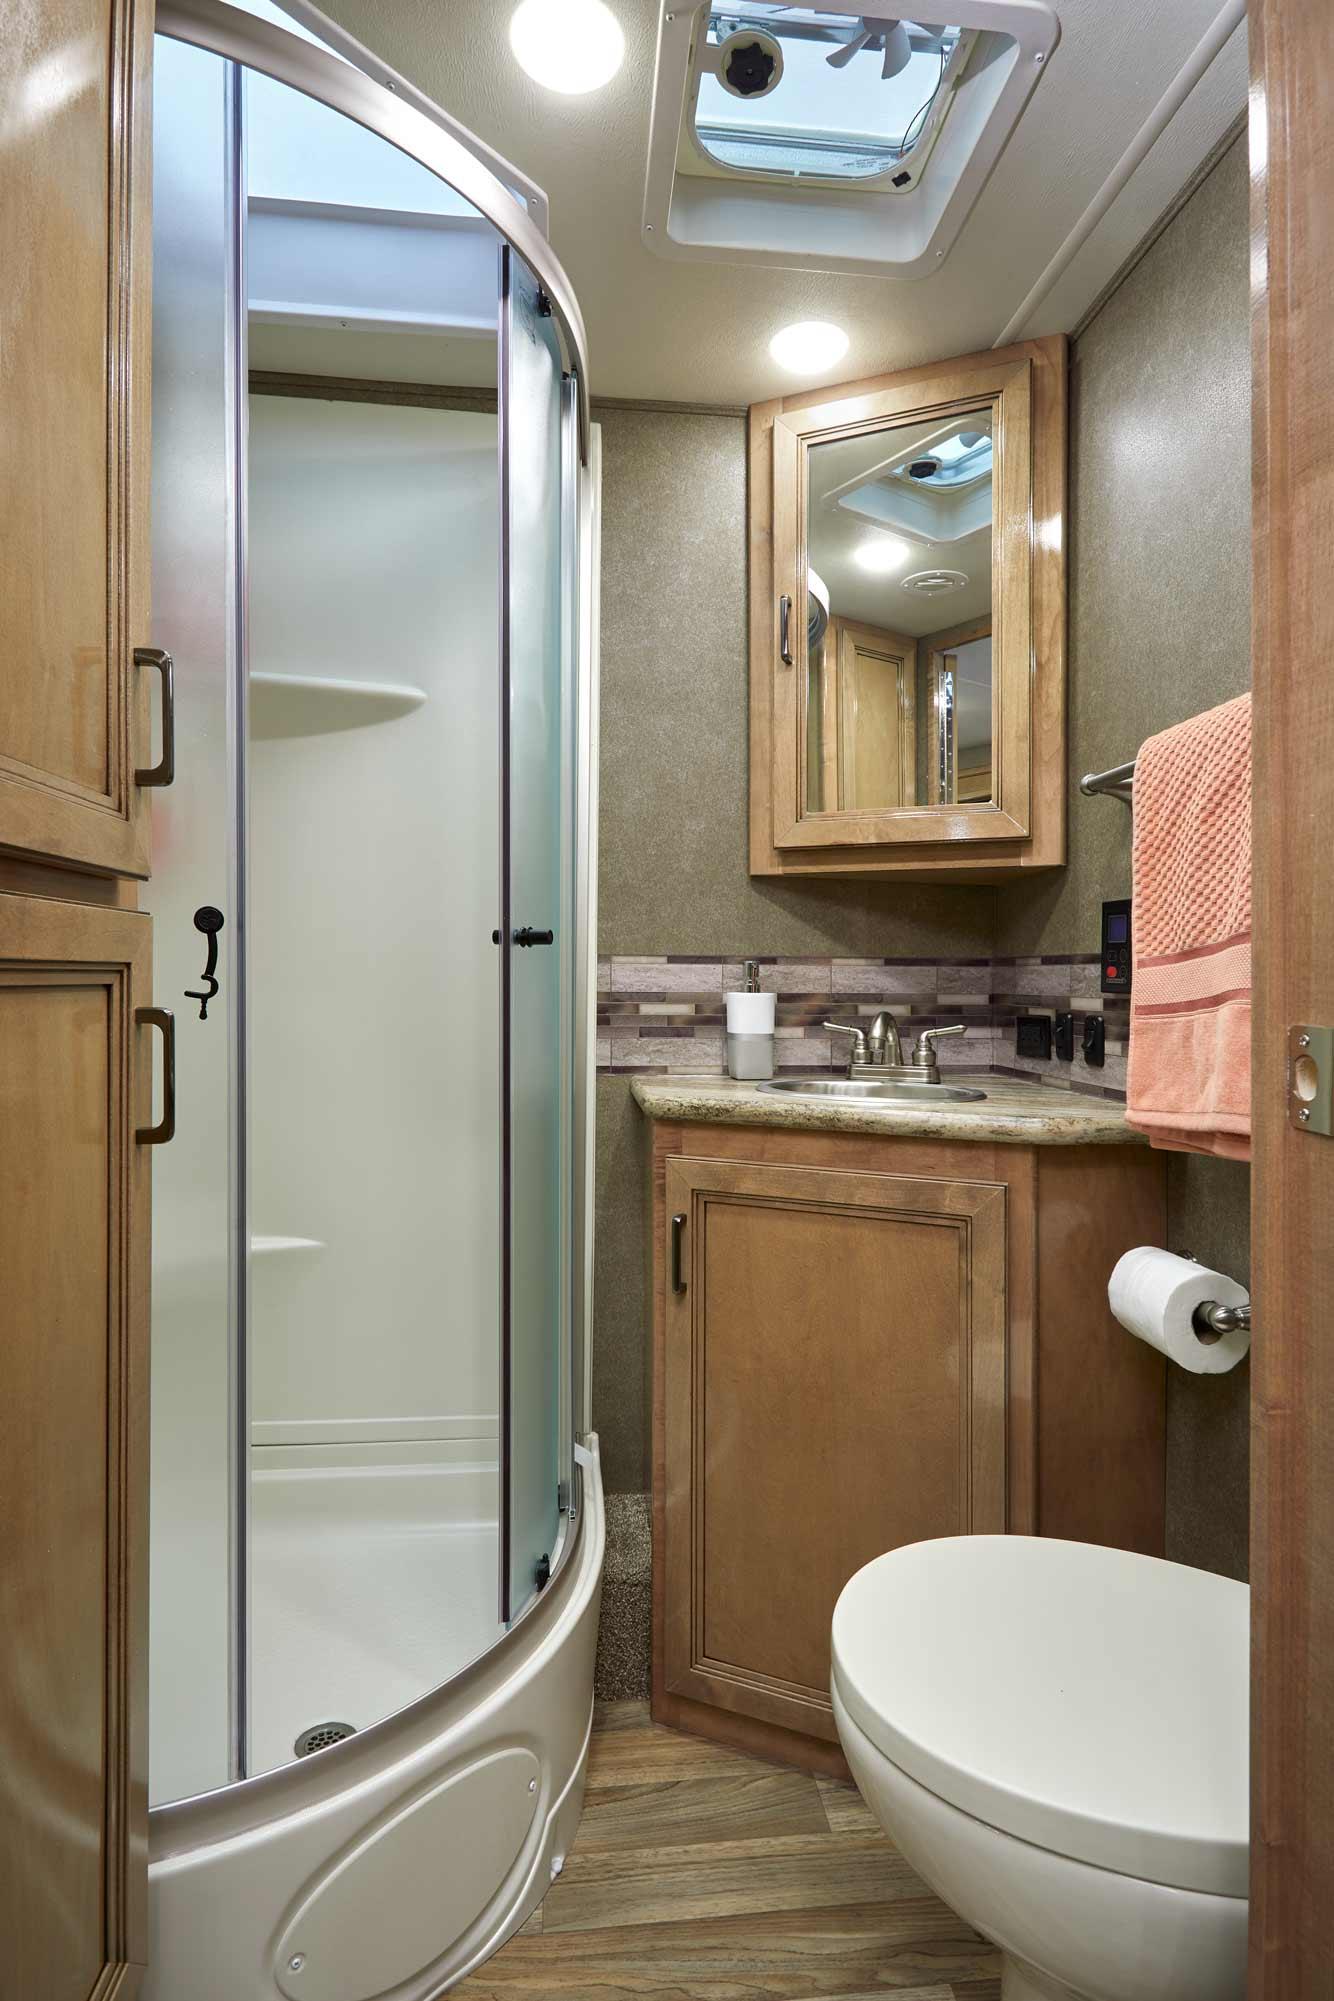 Quantum Class C Motorhomes Thor Motor Coach Axis F350 Fuse Box Diagram 2019 Ws31 Cloud Nine Prestige Maple Bathroom